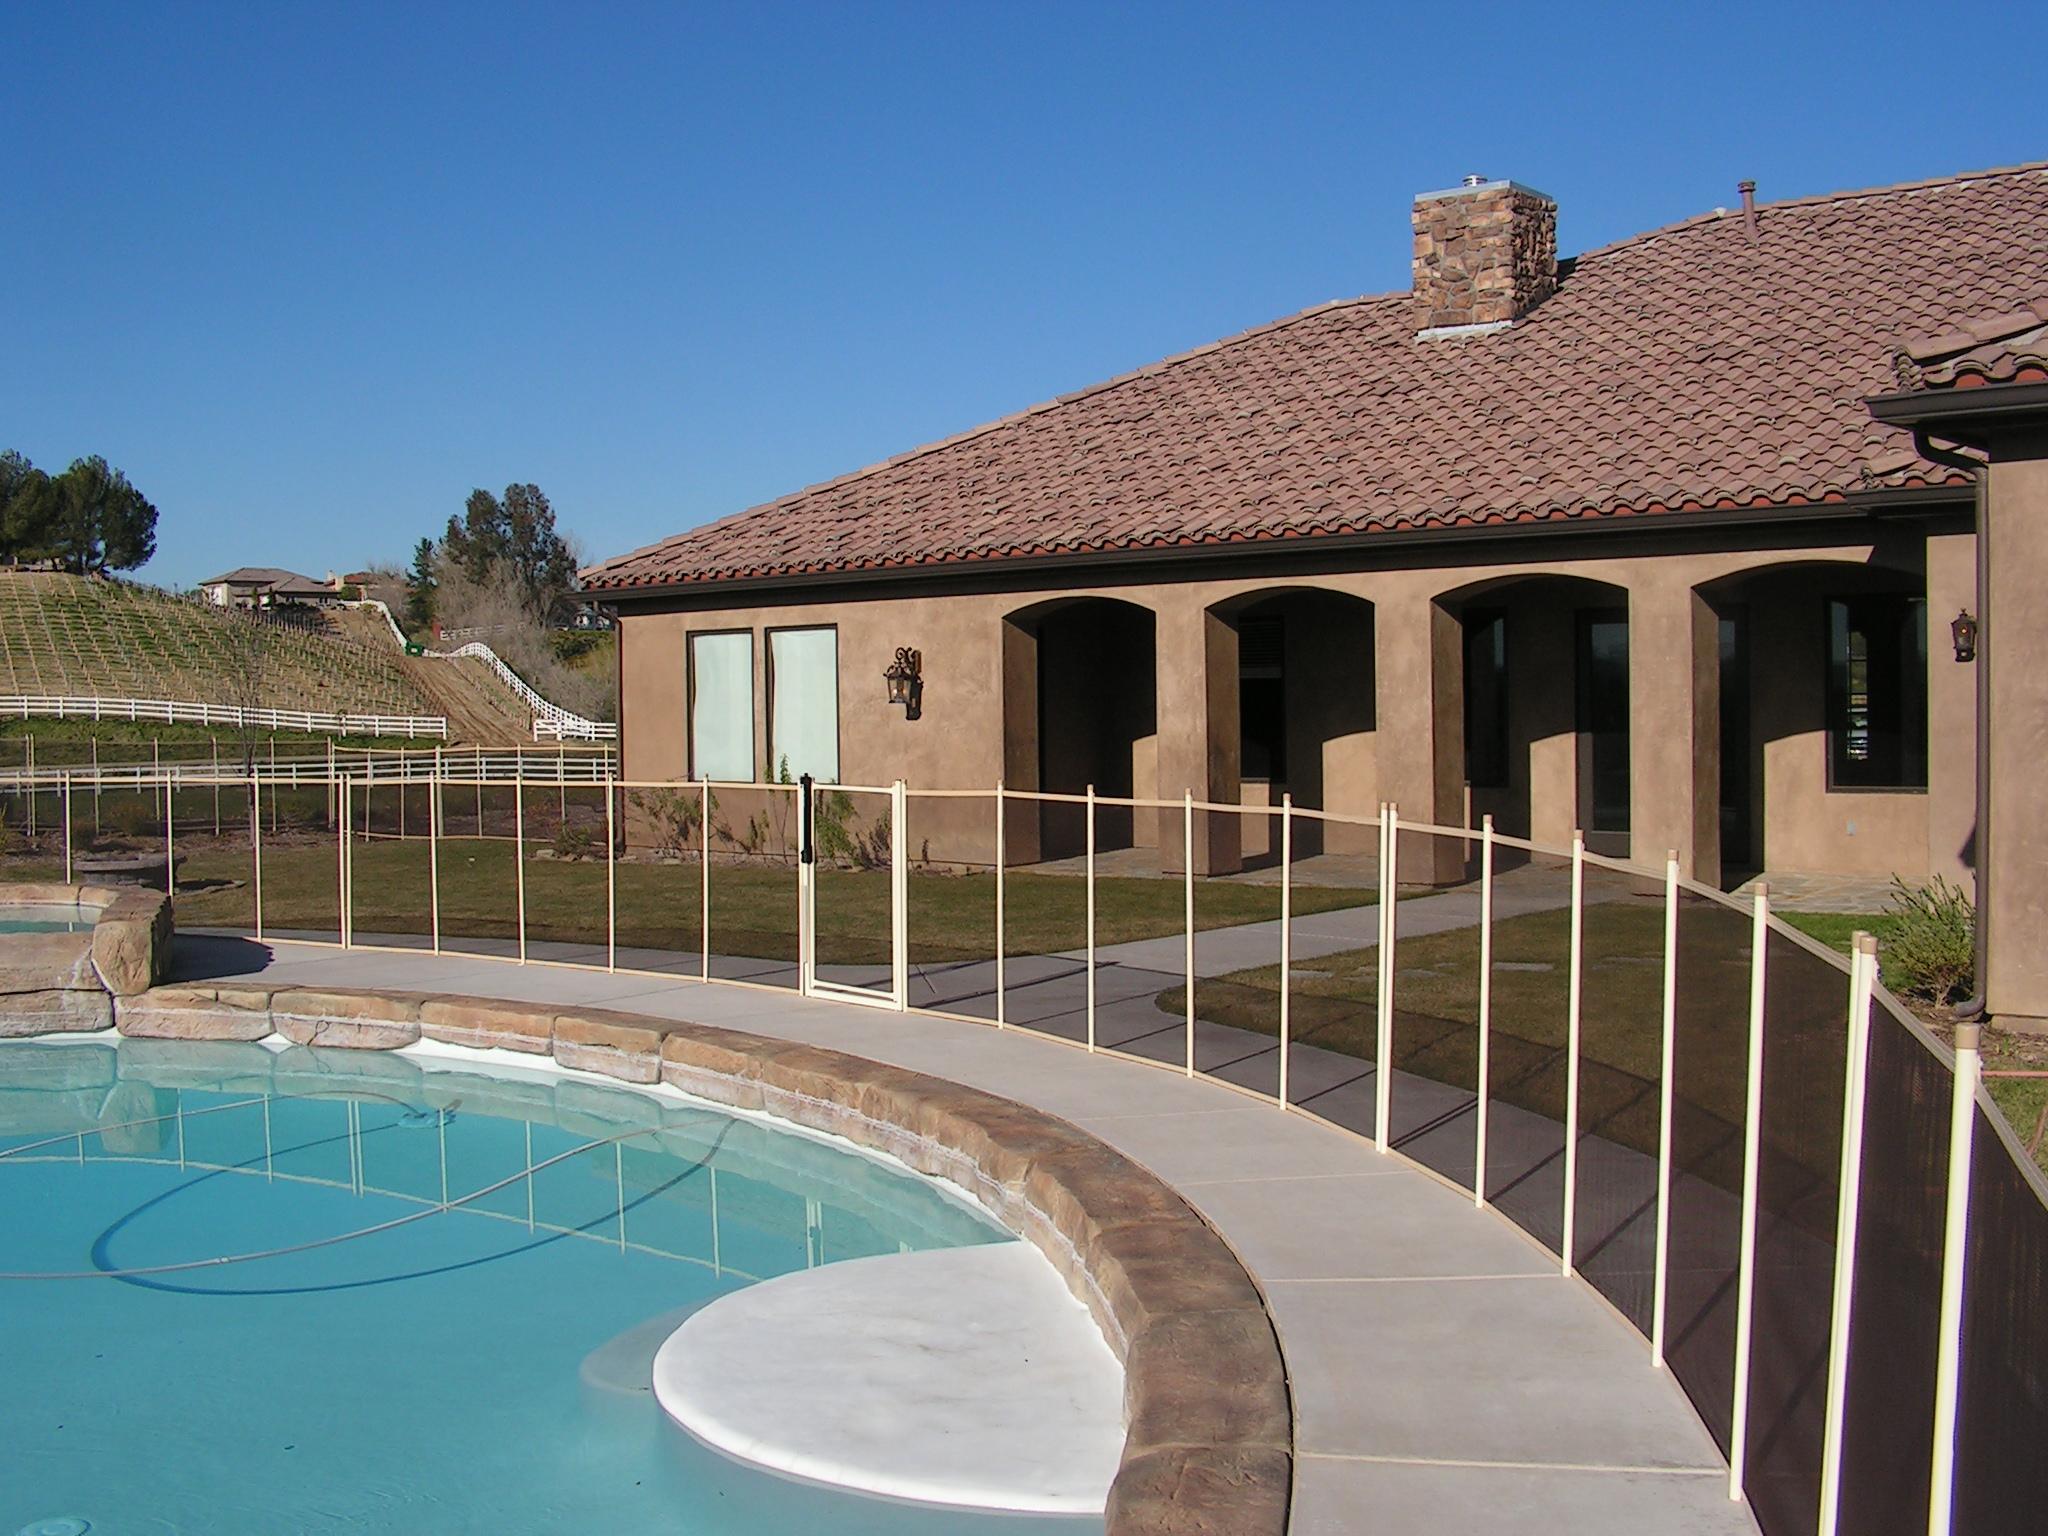 Pool guard san diego california localdatabase